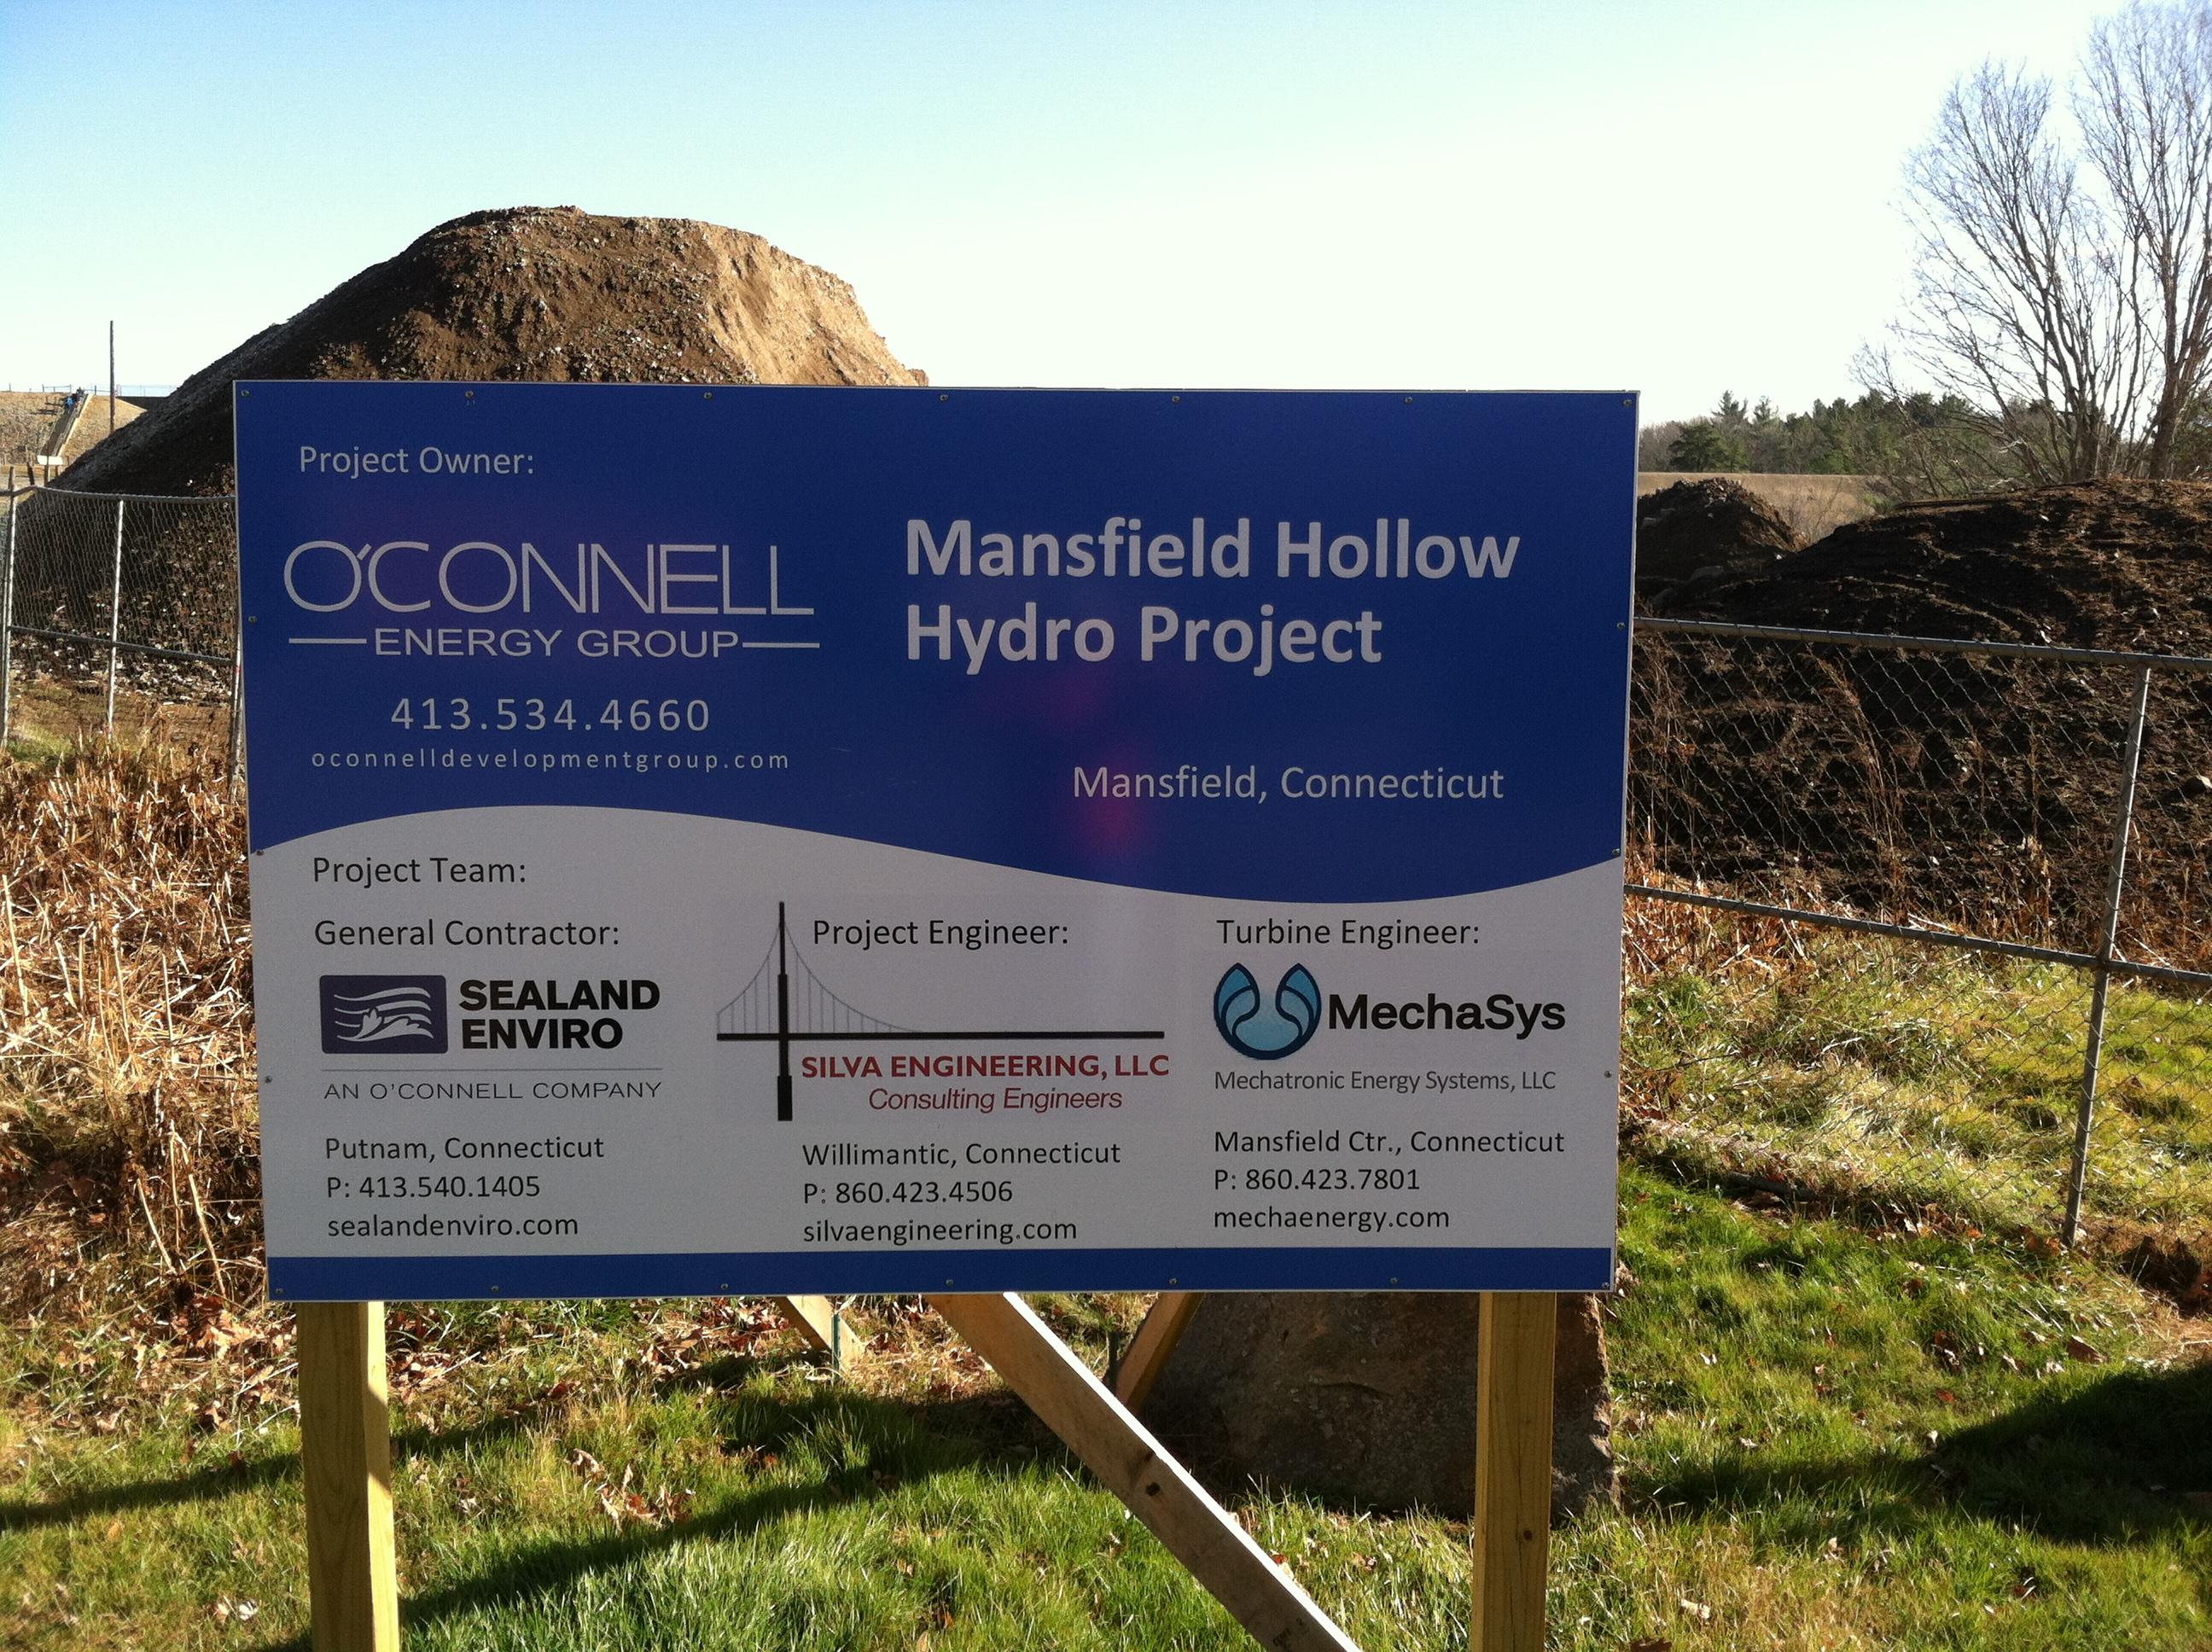 Sealand Enviro 187 Energy Mansfield Hollow Hydro